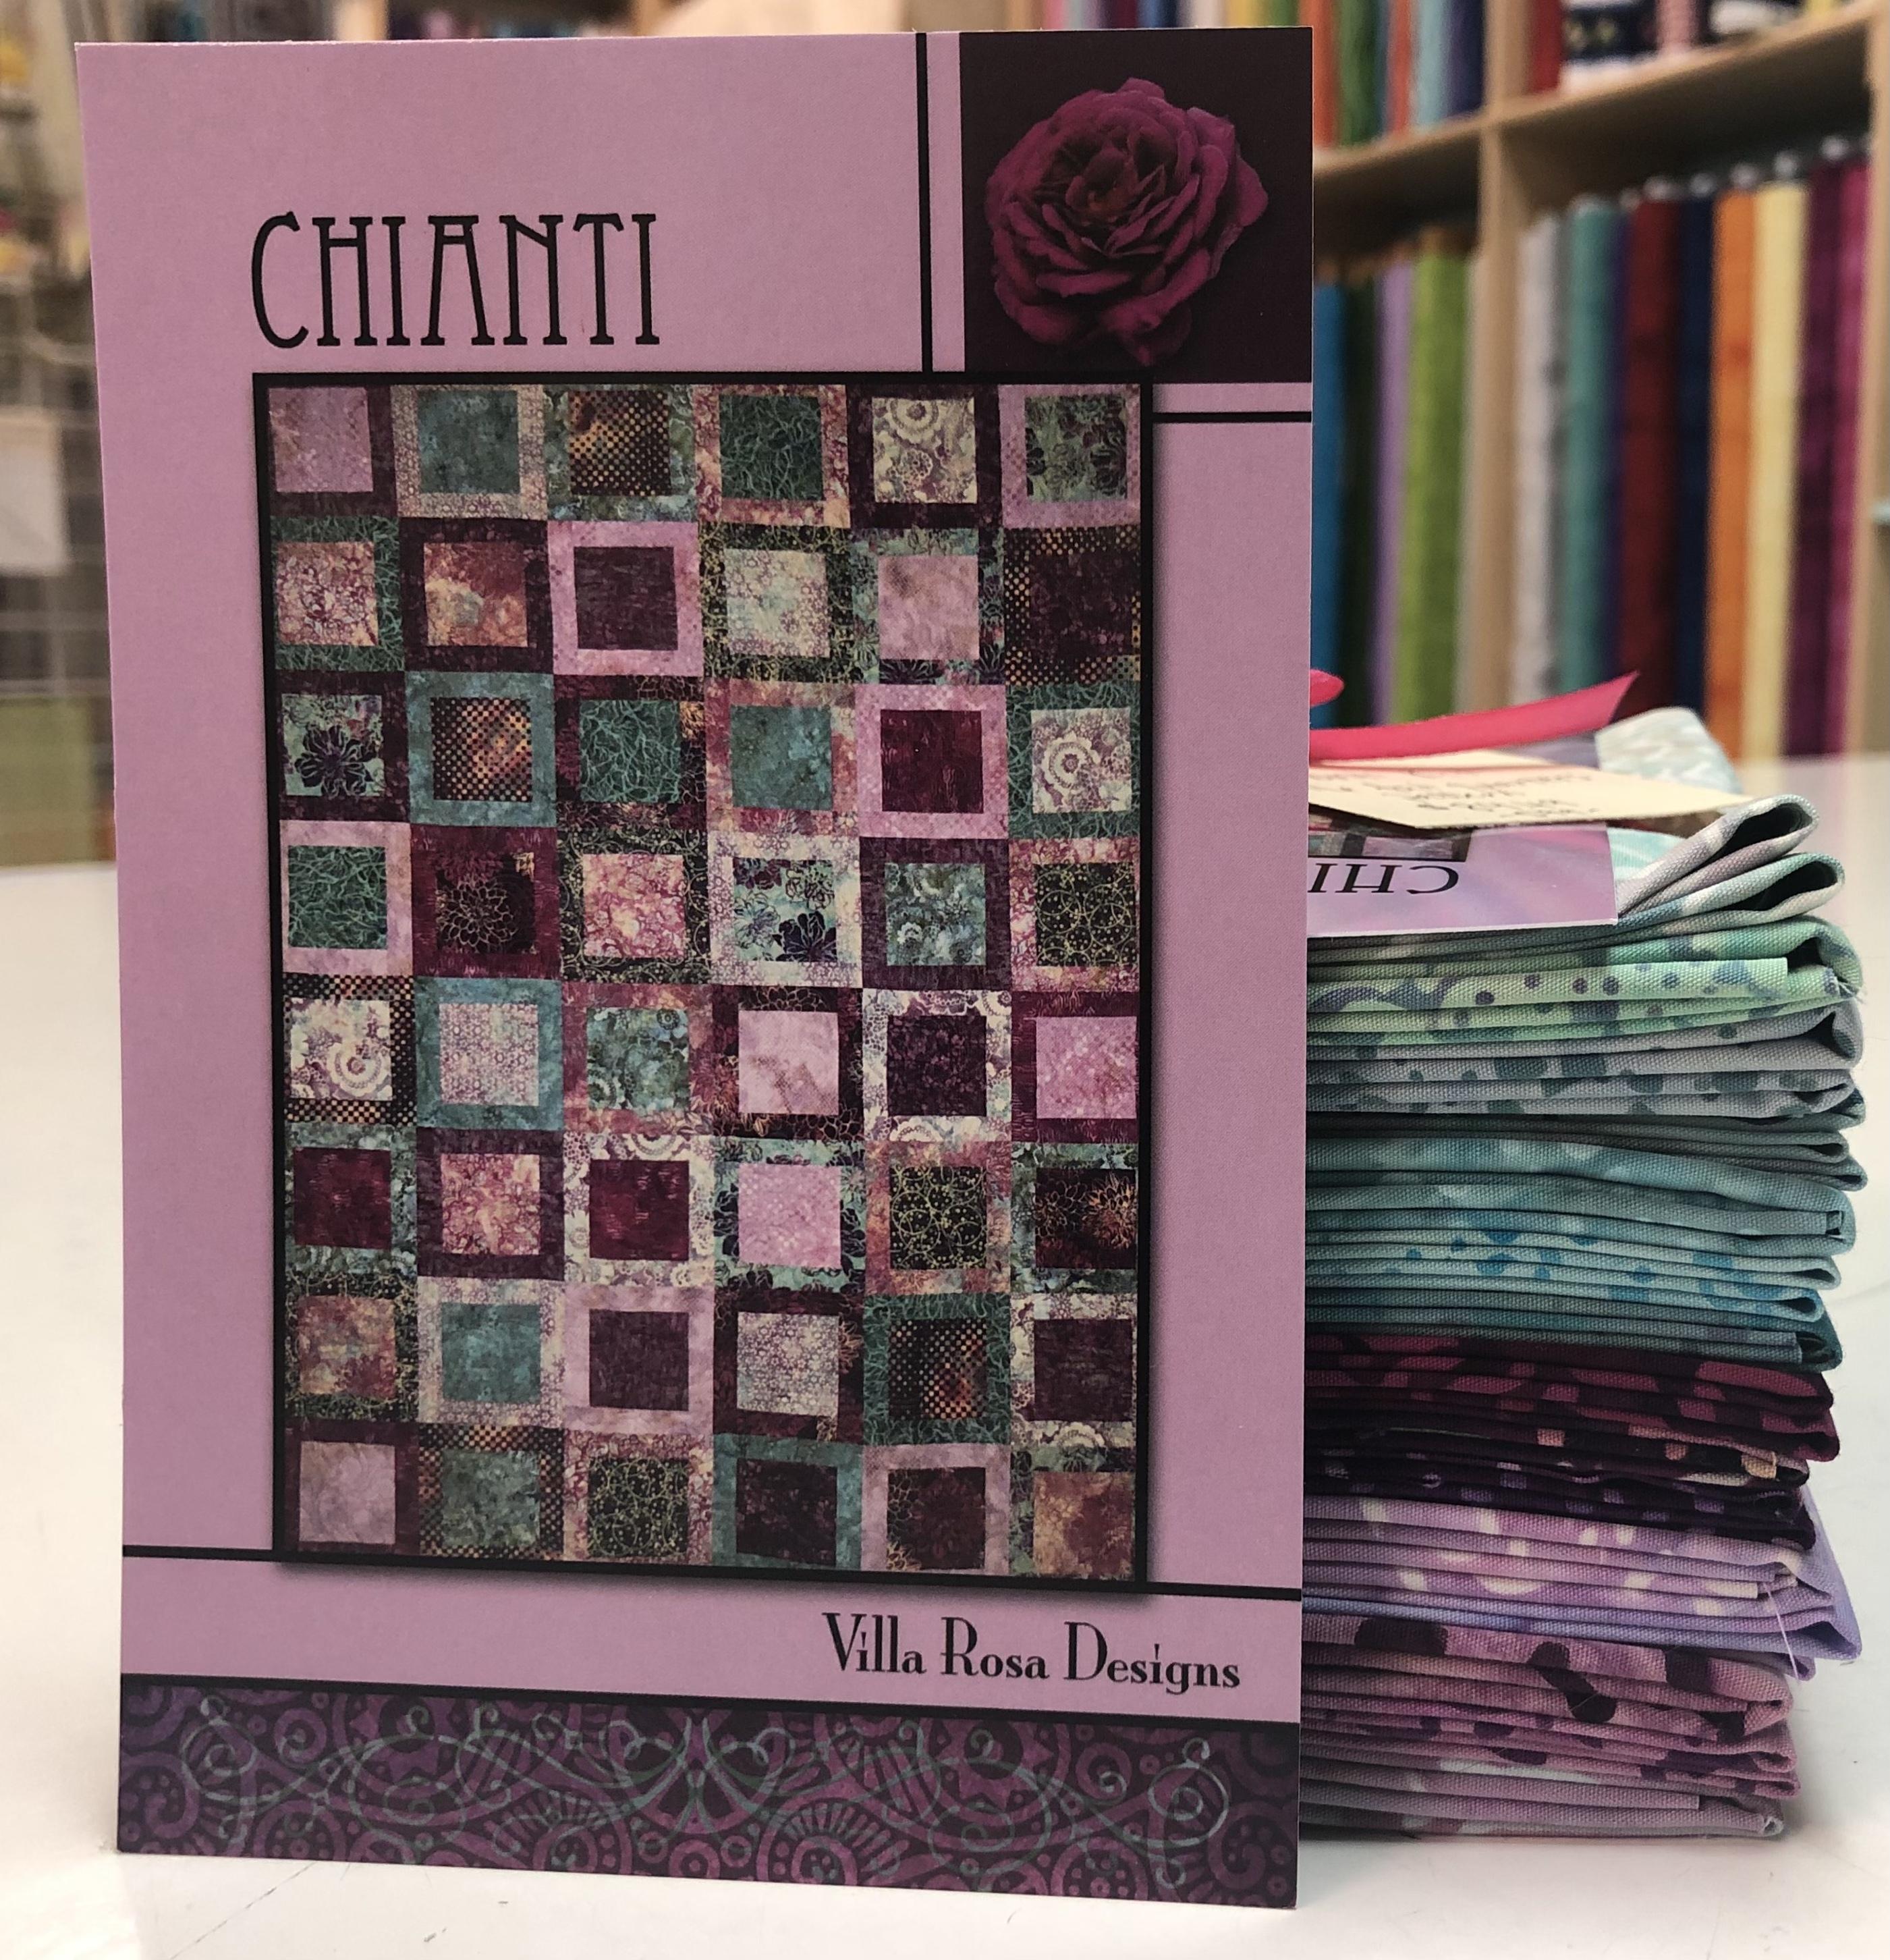 Chianti Quilt Kit 56090